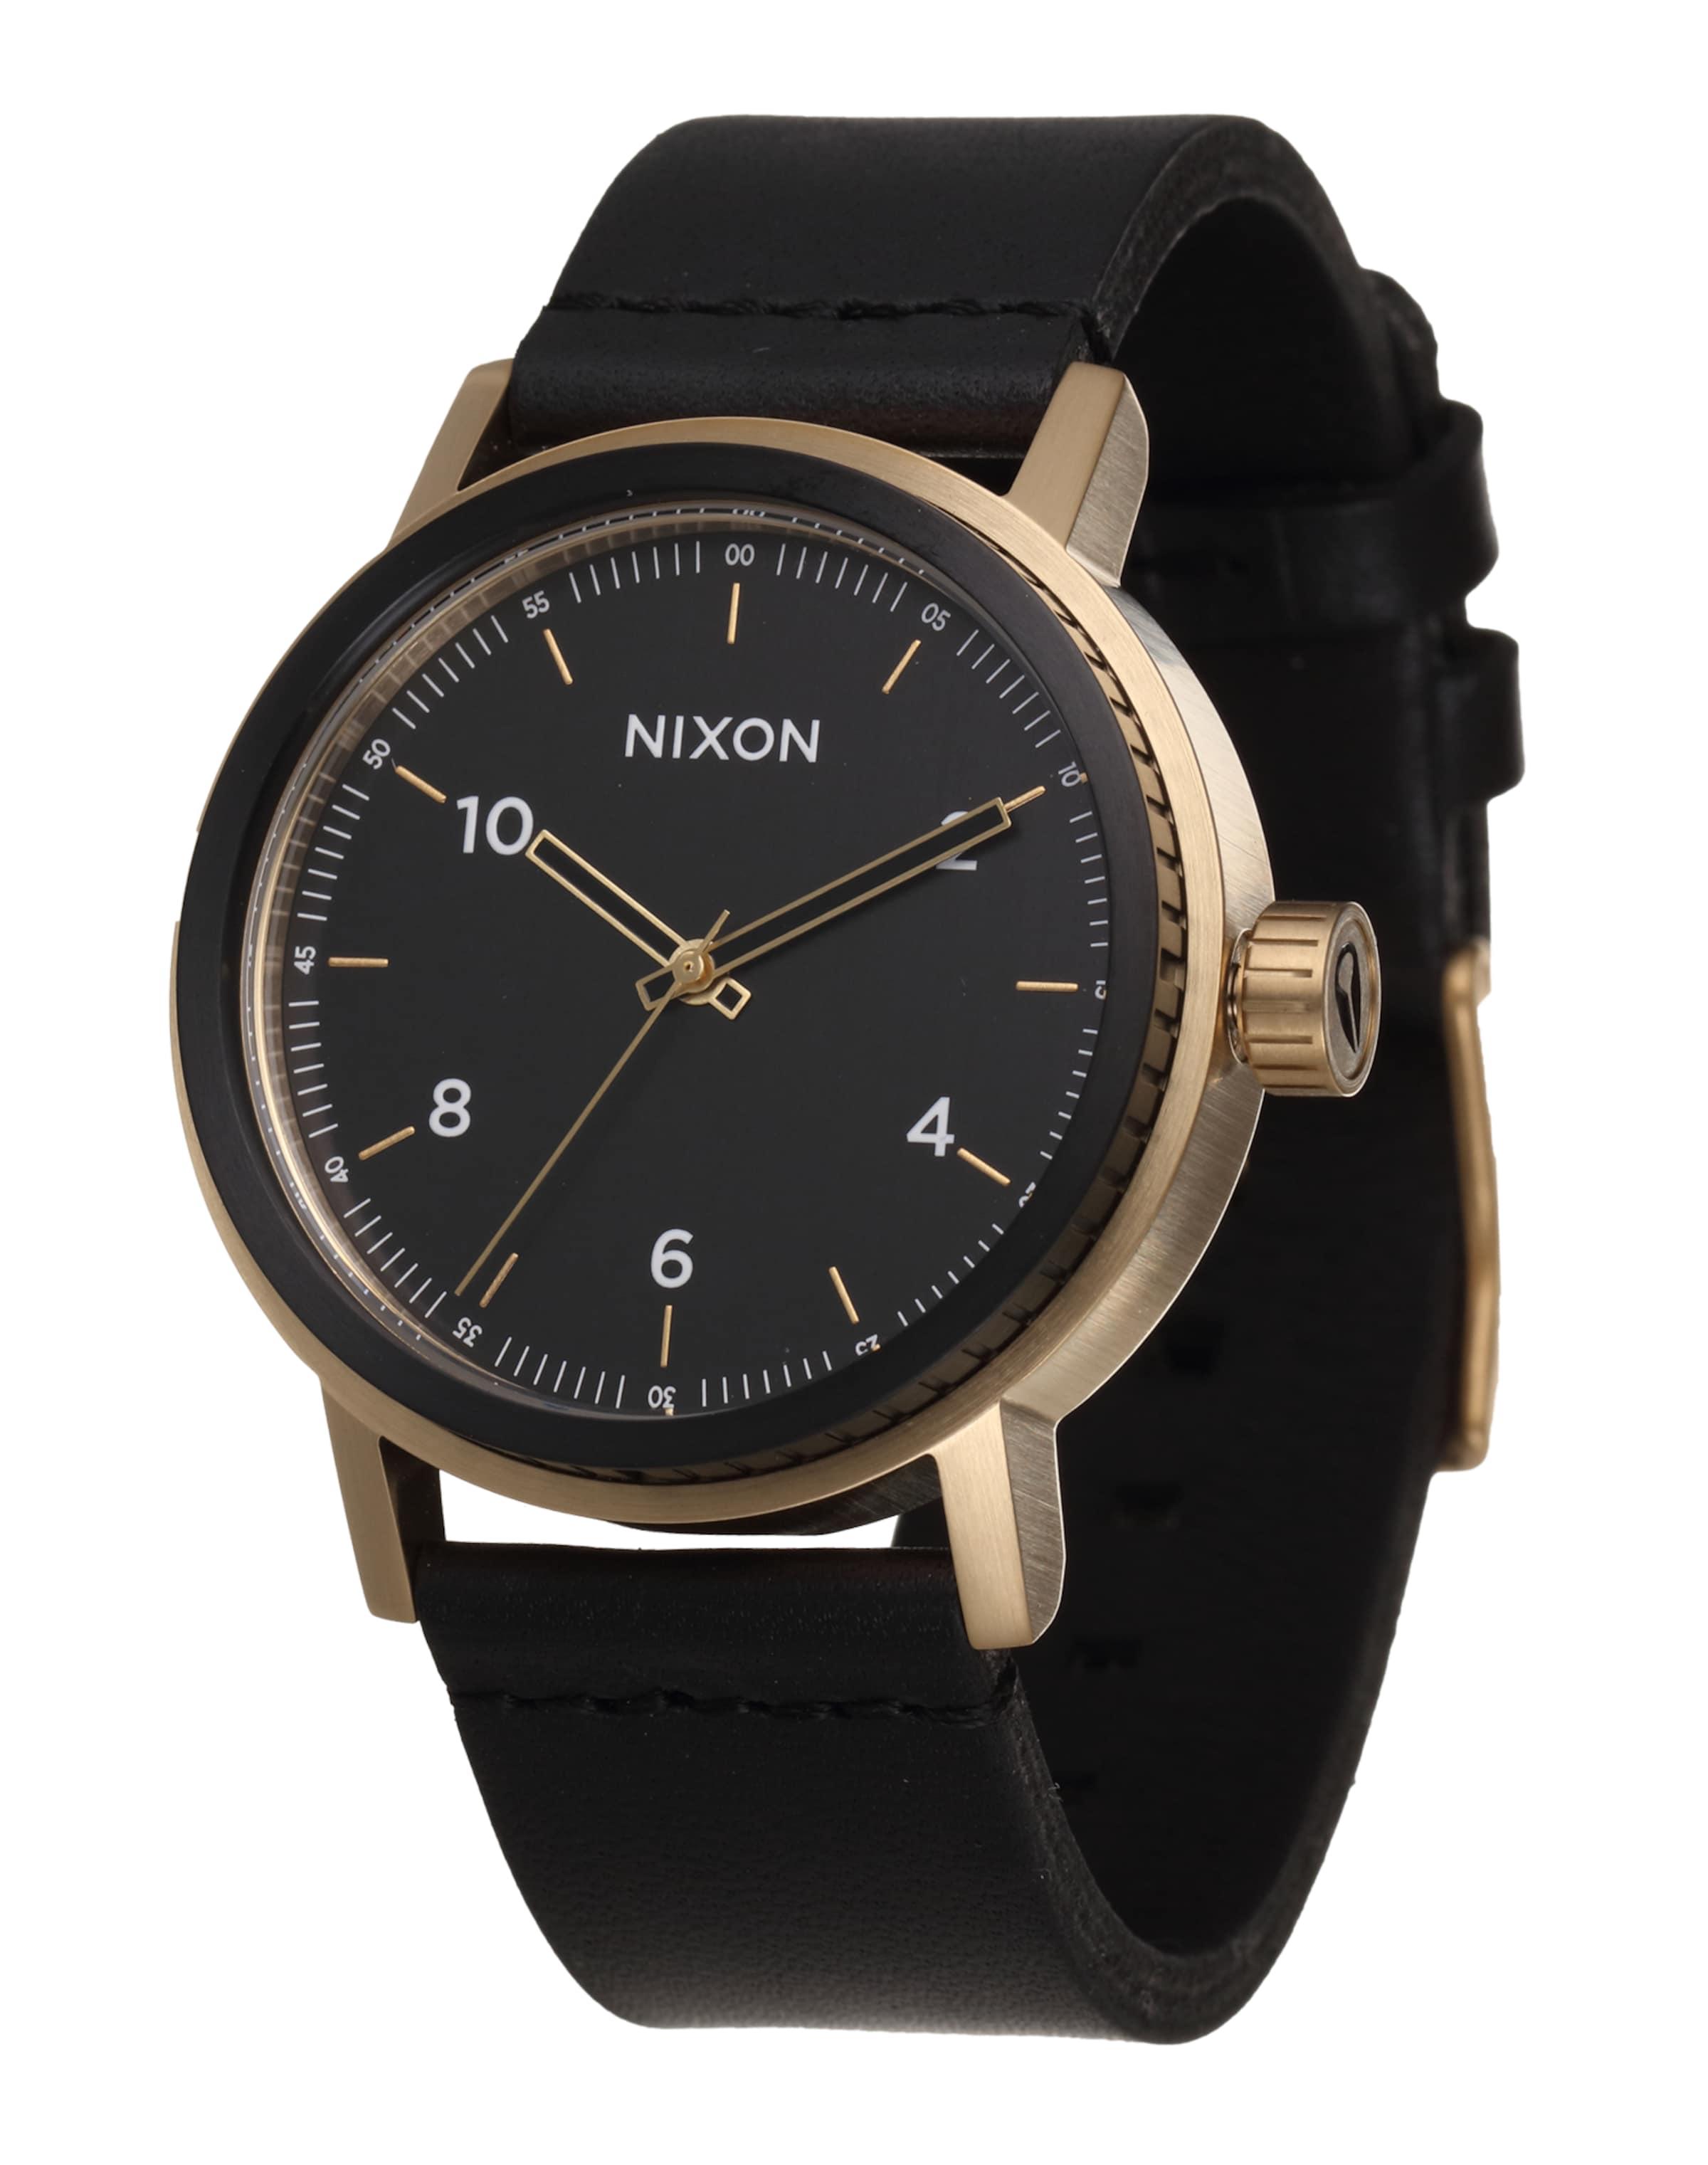 Mode Online-Verkauf Neueste Günstig Online Nixon Armbanduhr 'Stark Leather' uKJZA